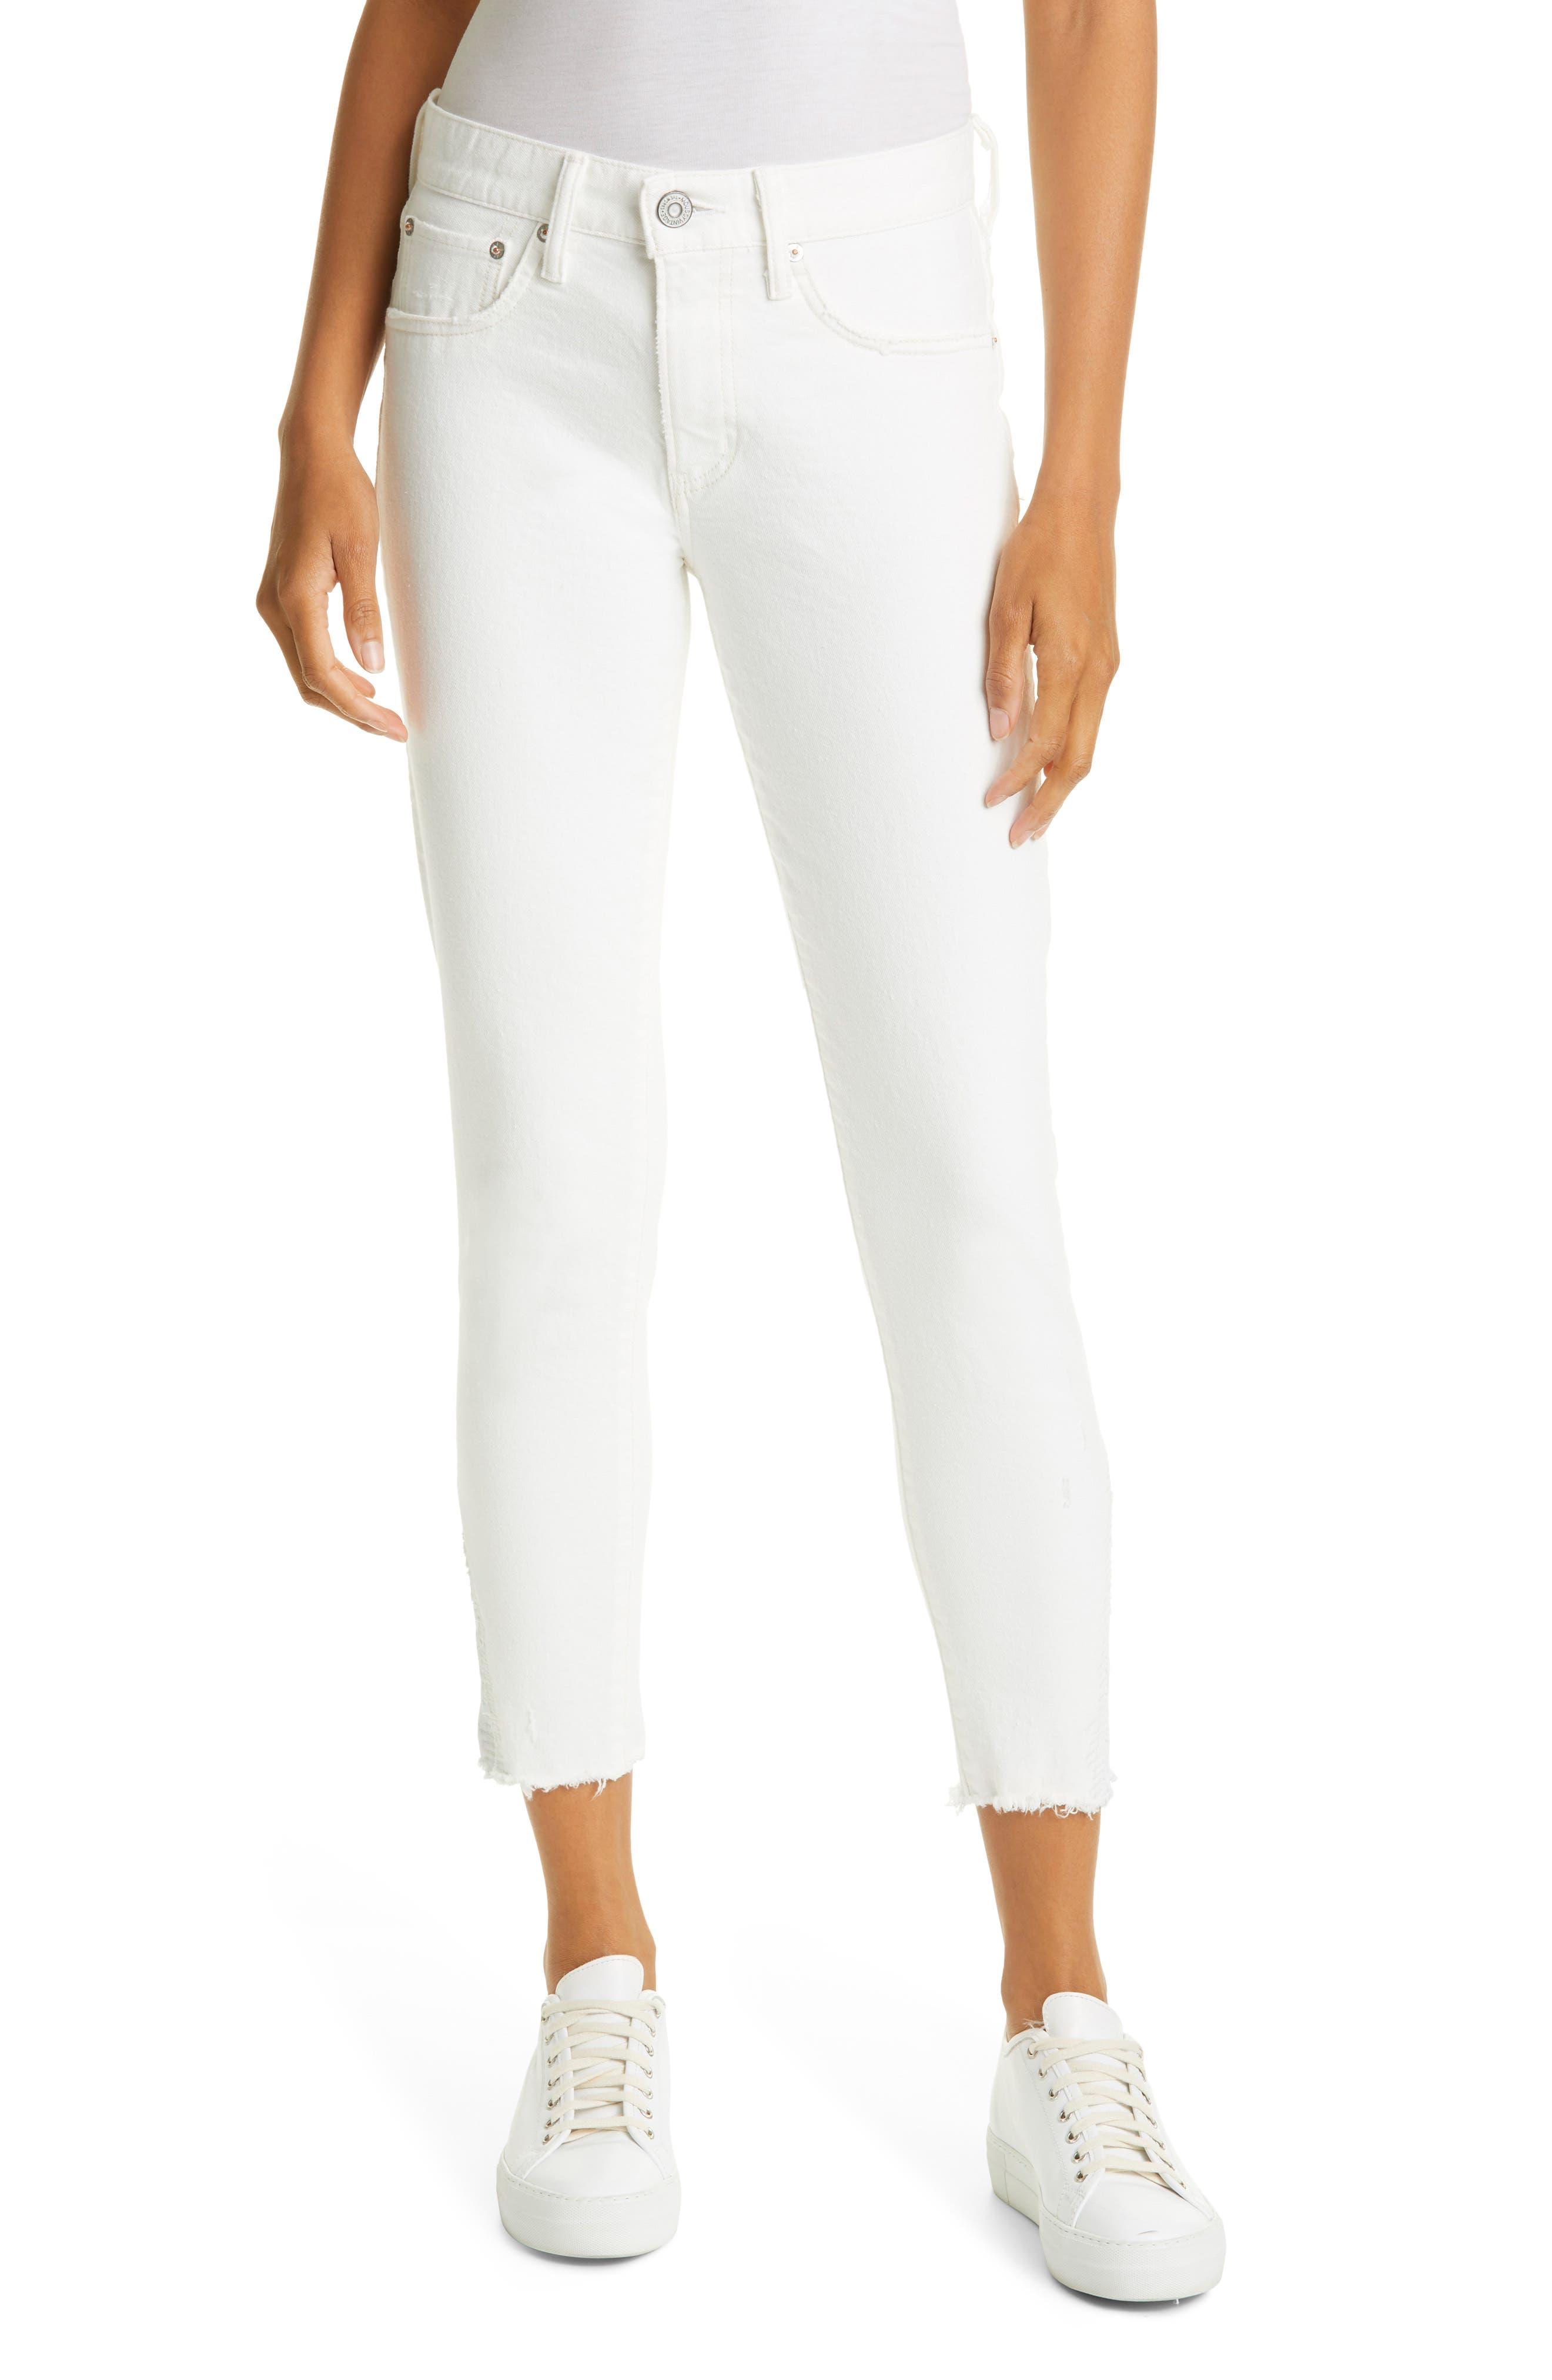 Burnside Distressed Raw Hem Skinny Jeans